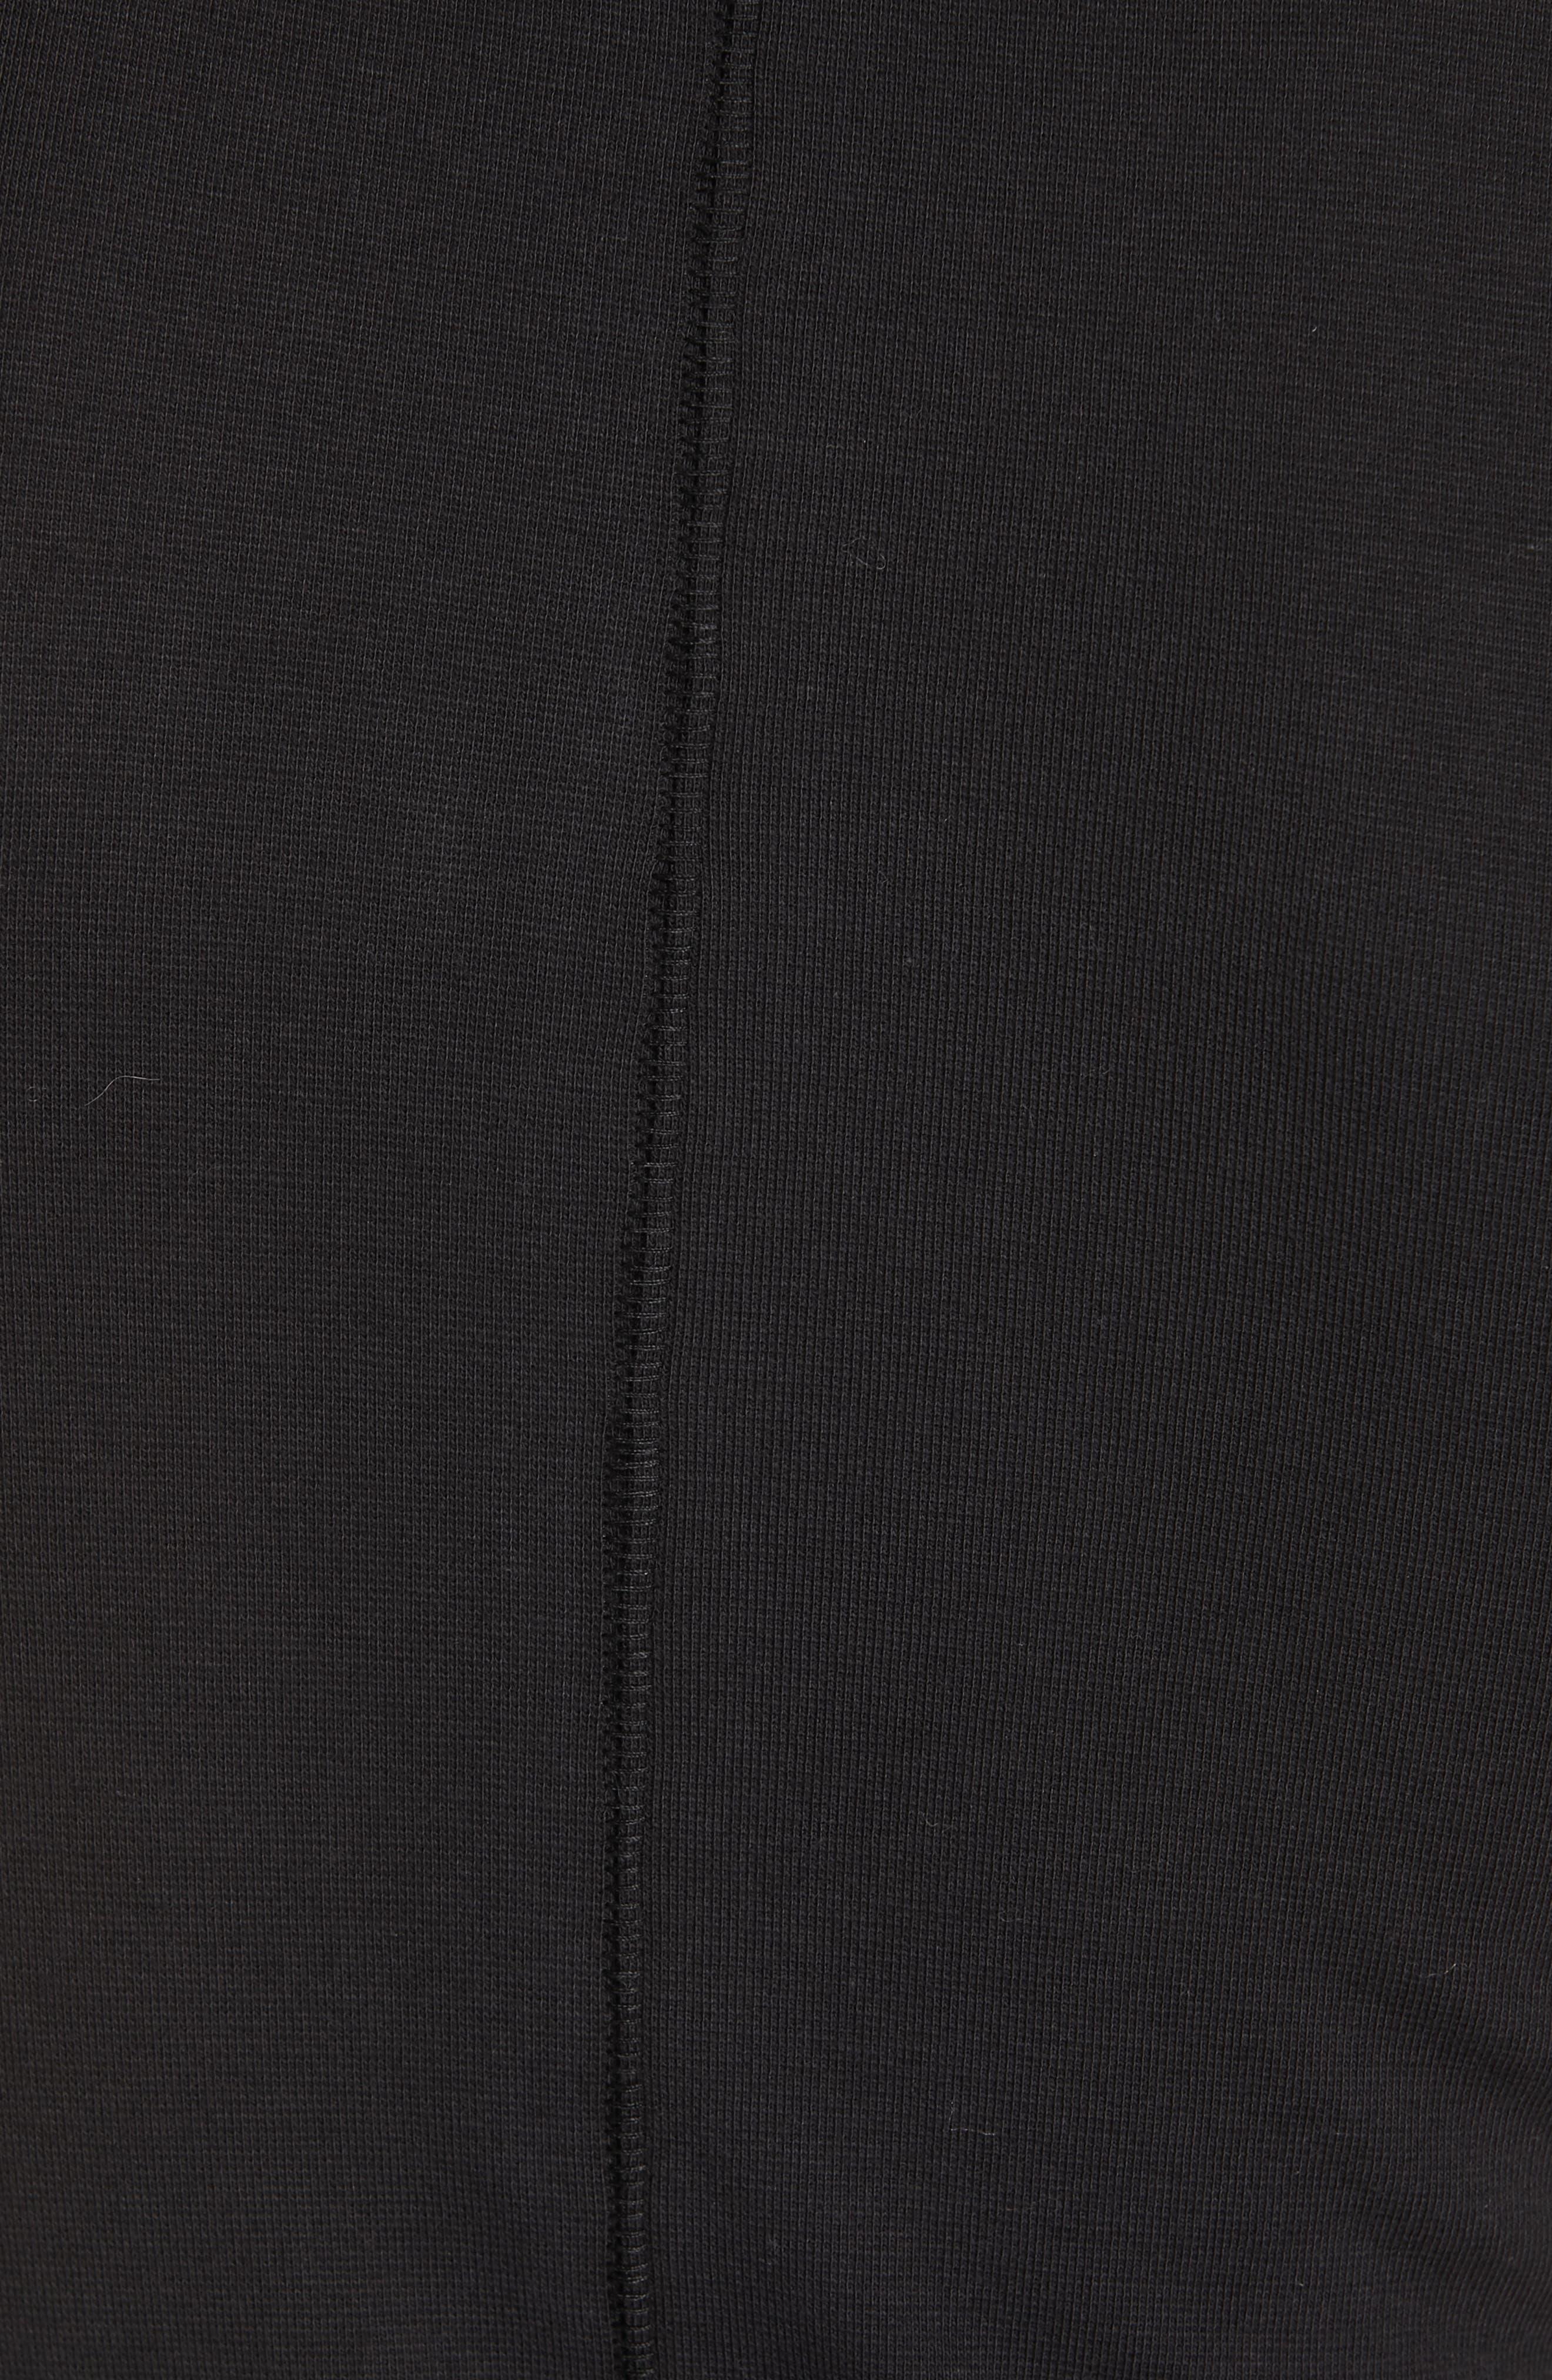 Sunshine Cowl Neck Stretch Cotton Tee,                             Alternate thumbnail 5, color,                             BLACK